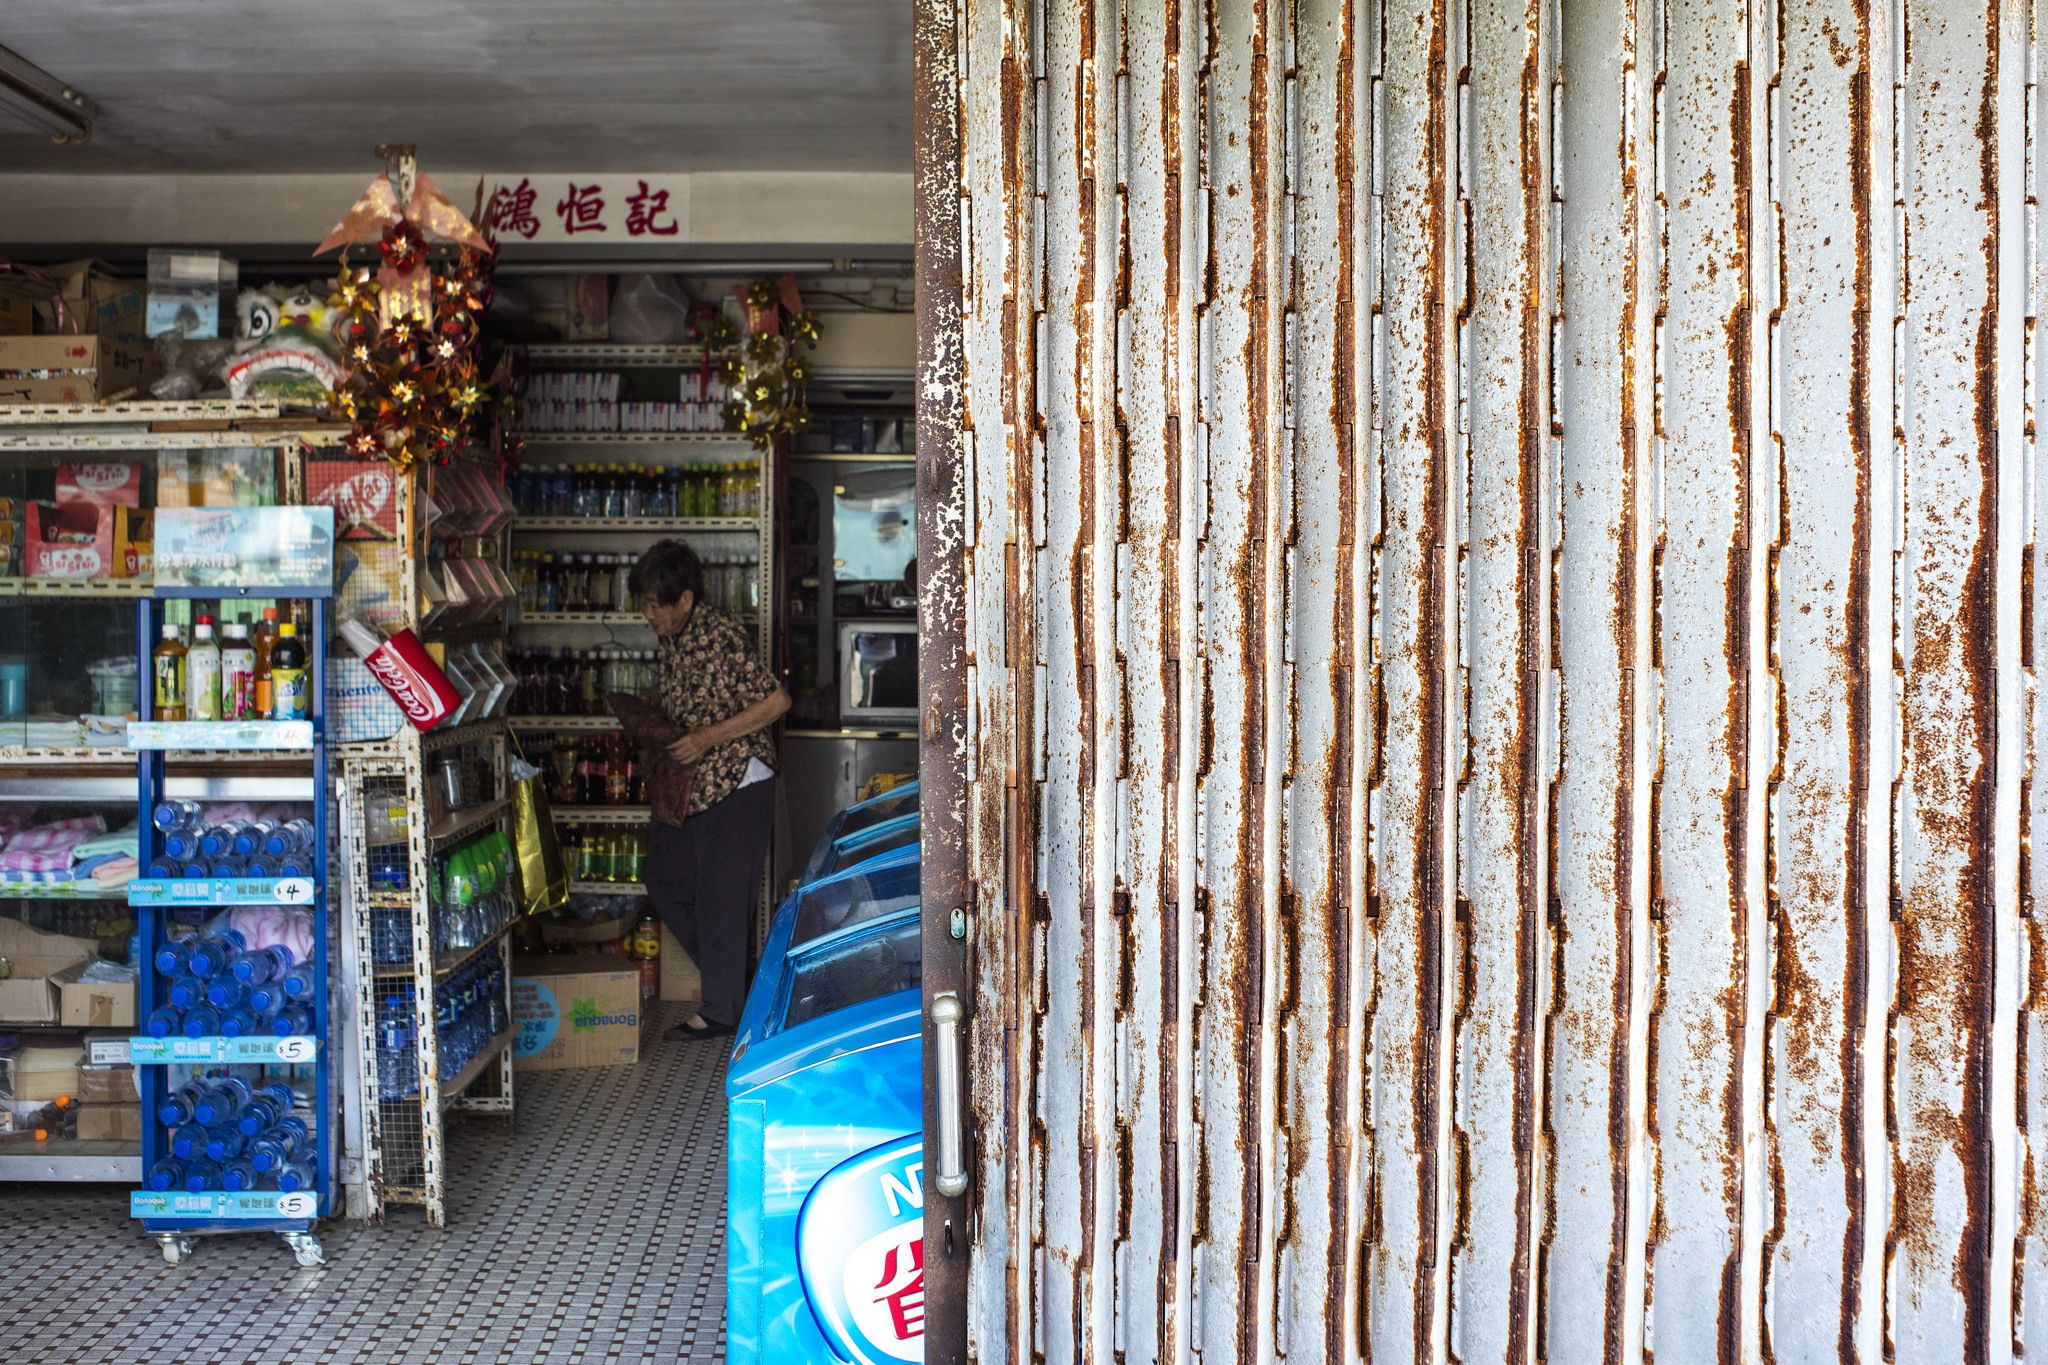 Old Style Store   相片擁有者 工山ヒロ